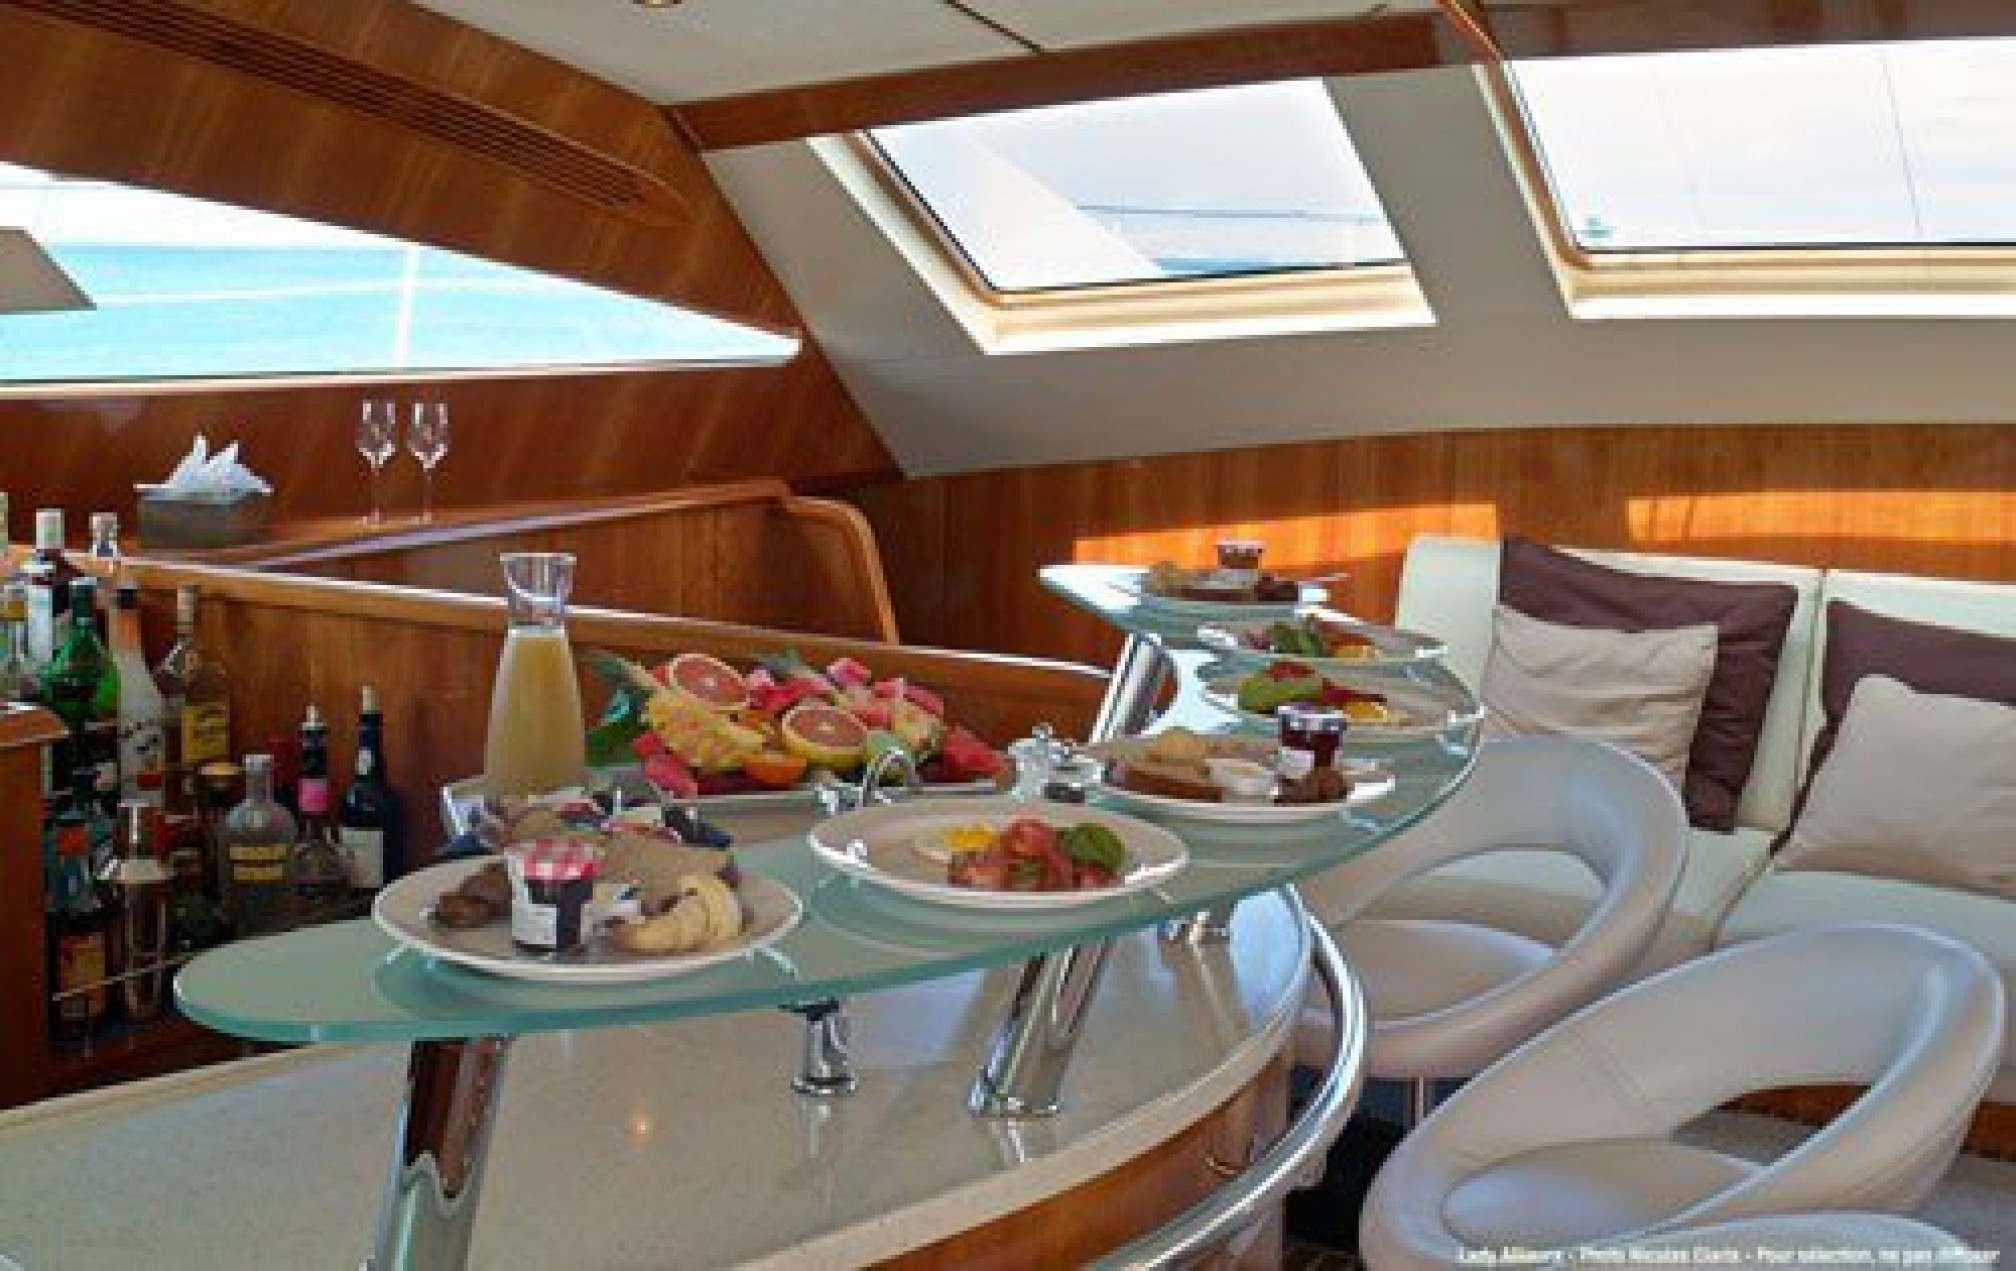 Privilege 745 'Lady Alliaura' catamaran charter salon